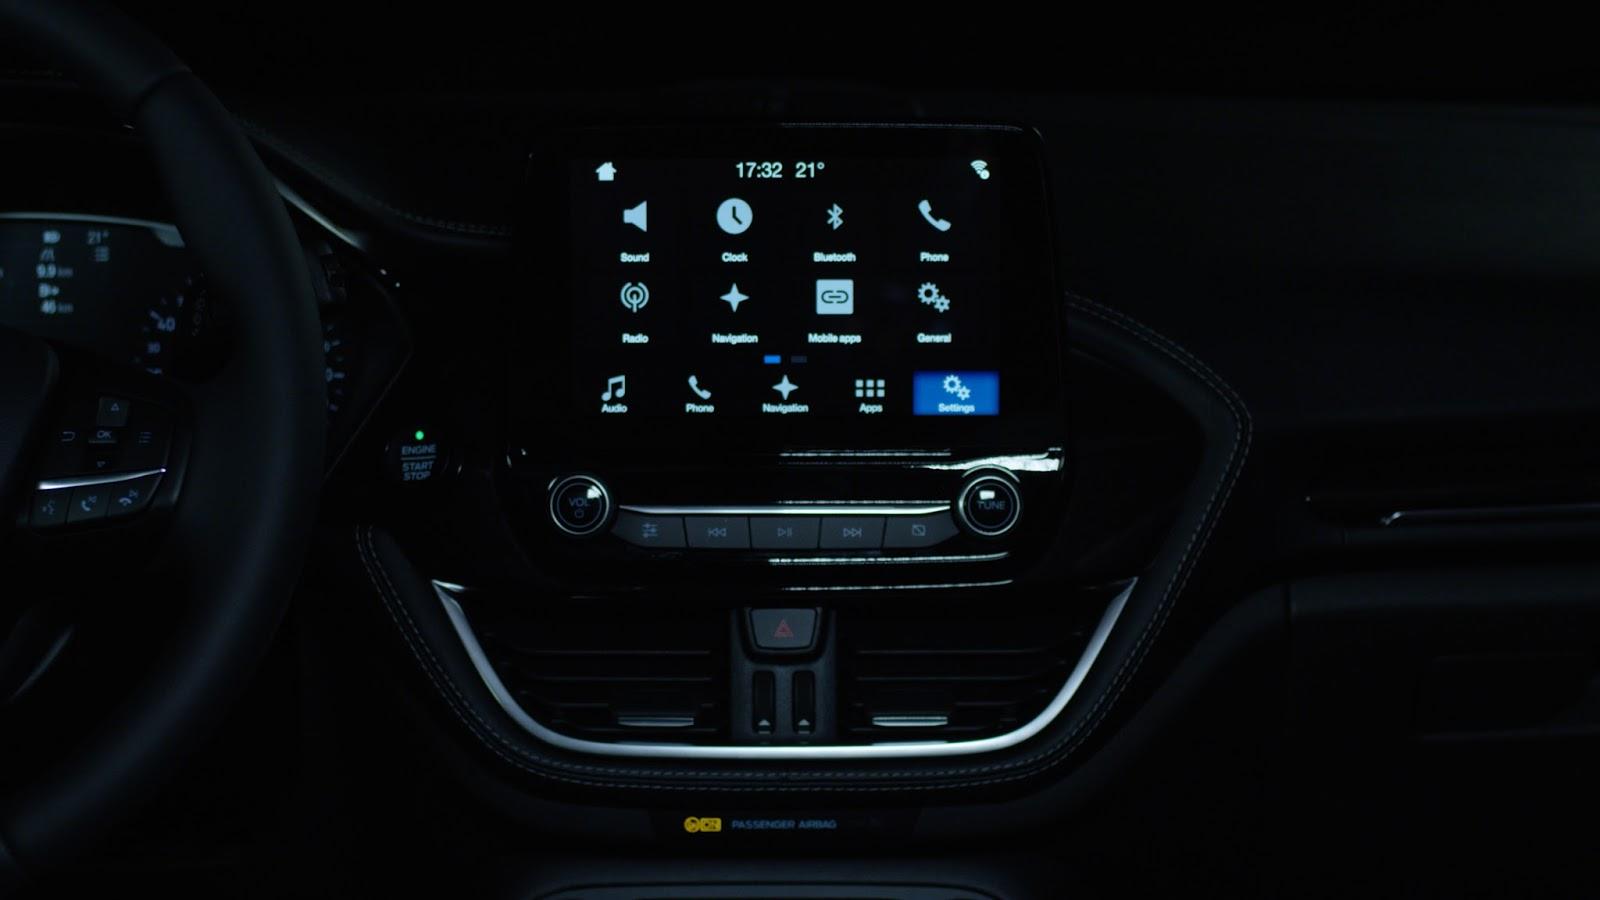 FordFiesta InteriorDesignTour 01 Τα πρώτα Ford Fiesta έρχονται στην Ελλάδα, με τιμή από 12.990€ Bestseller, Ford, Ford Fiesta, supermini, Λανσάρισμα